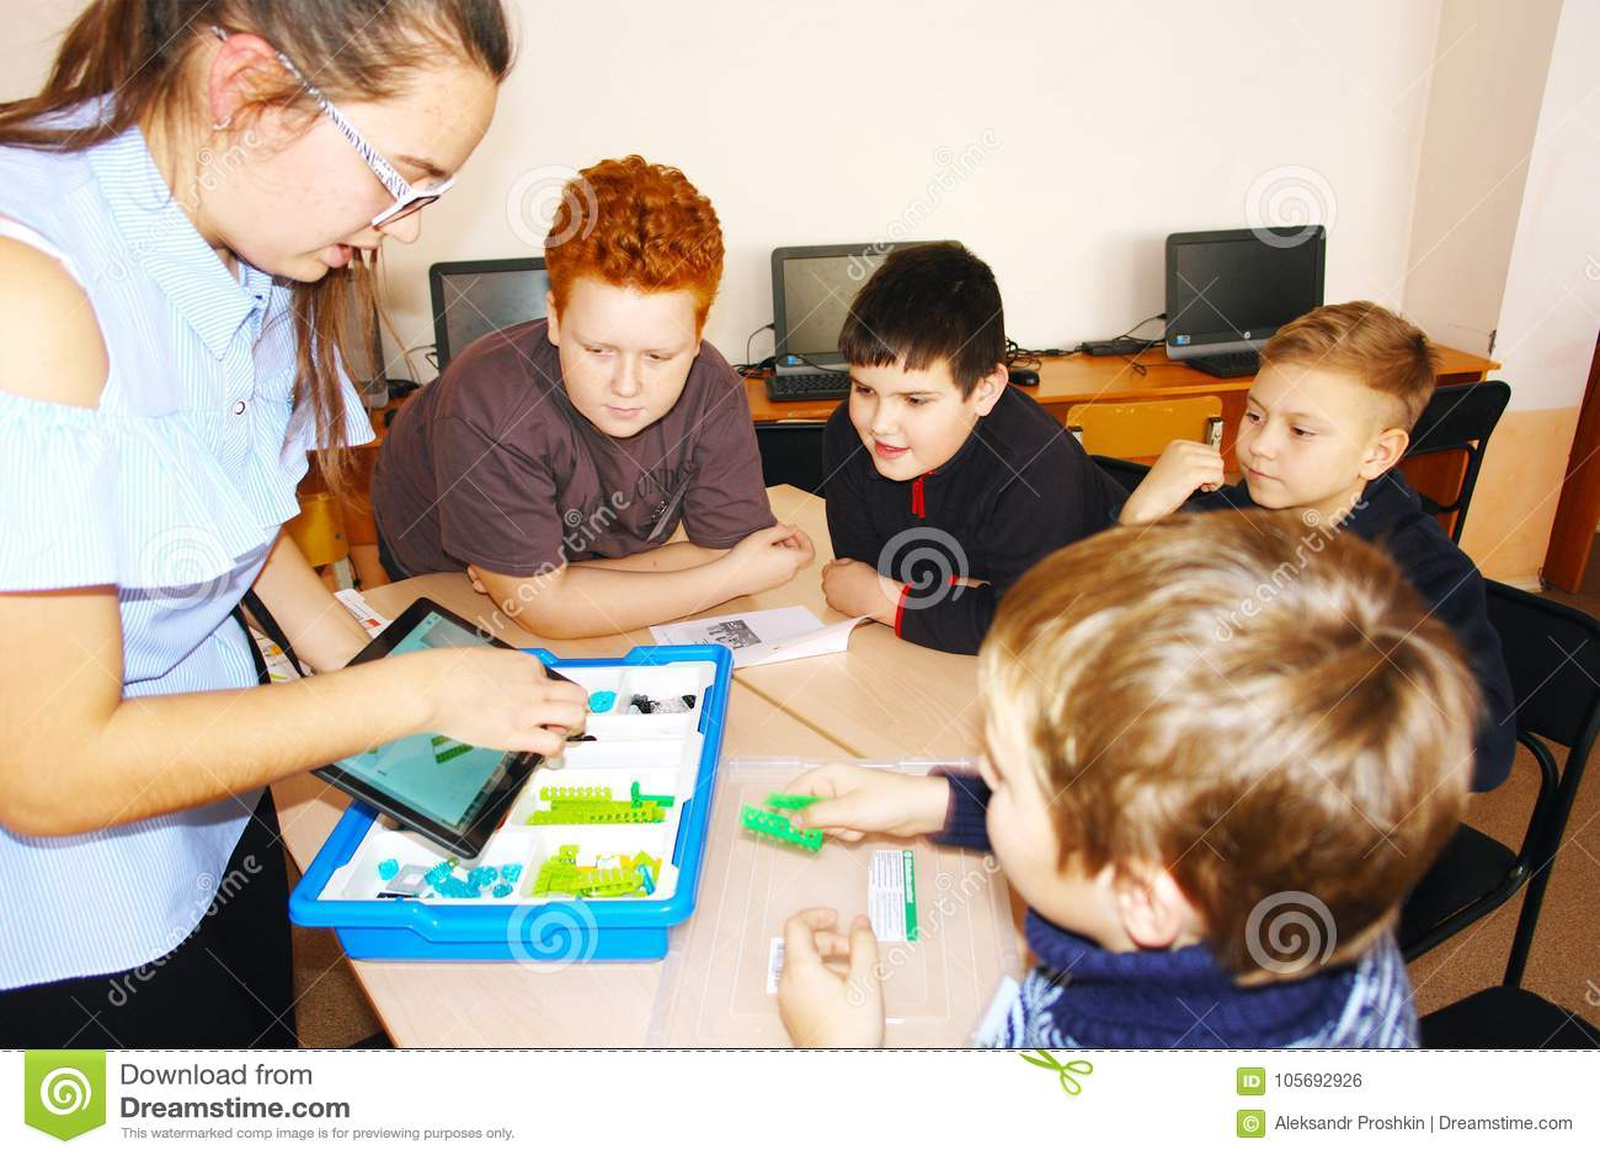 CHAPAEVSK, SAMARA REGION, RUSSIA - DECEMBER 07, 2017: School kids in class with teacher woman